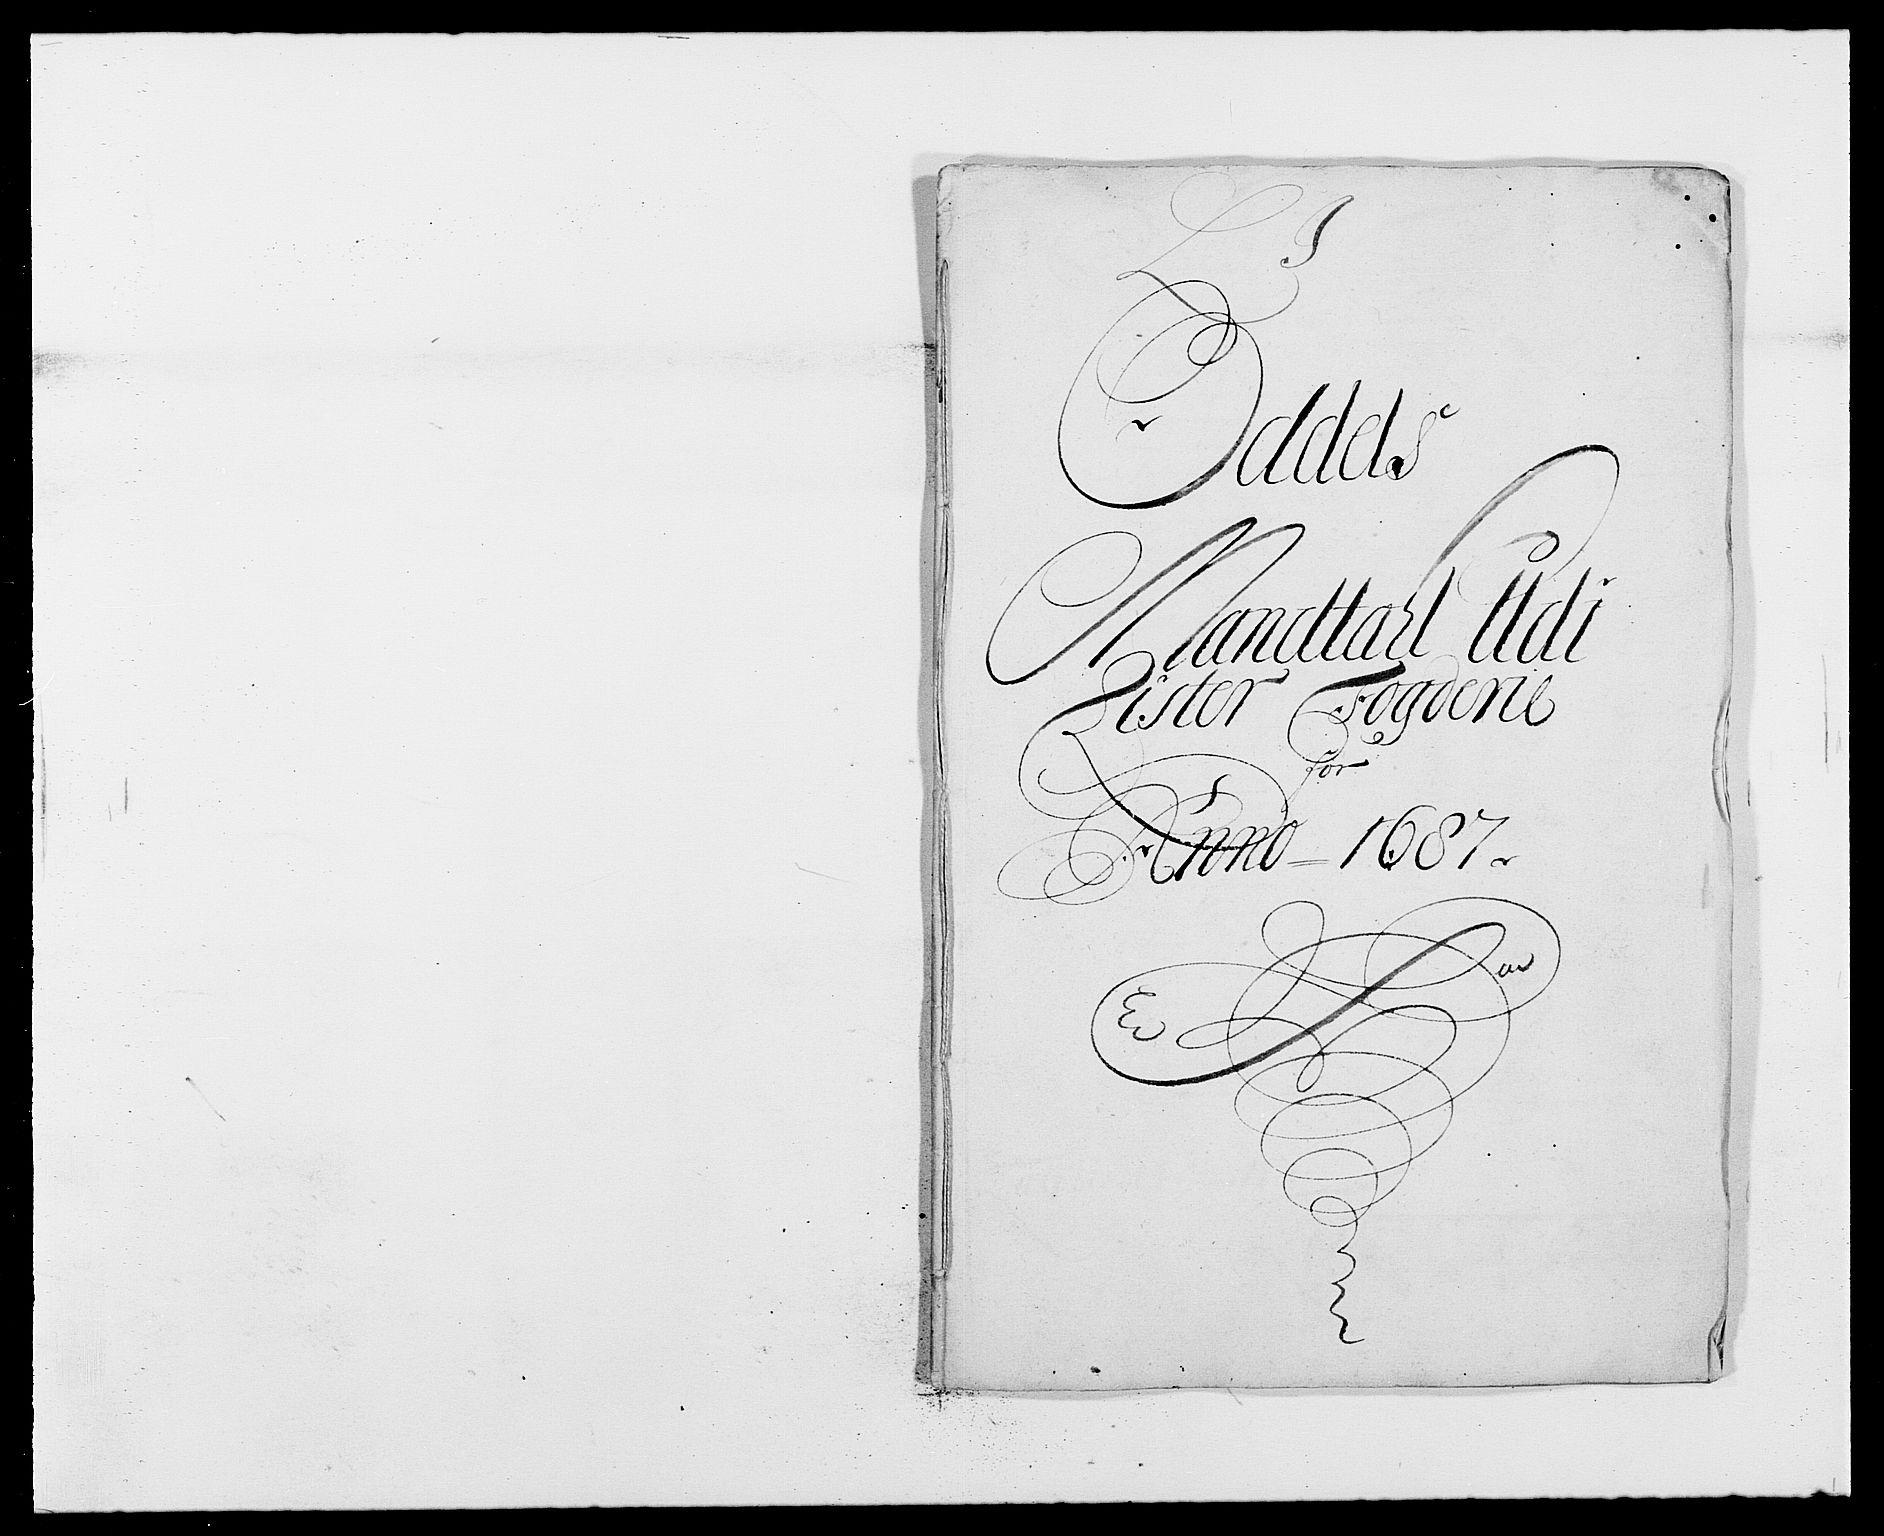 RA, Rentekammeret inntil 1814, Reviderte regnskaper, Fogderegnskap, R41/L2534: Fogderegnskap Lista, 1686-1688, s. 160